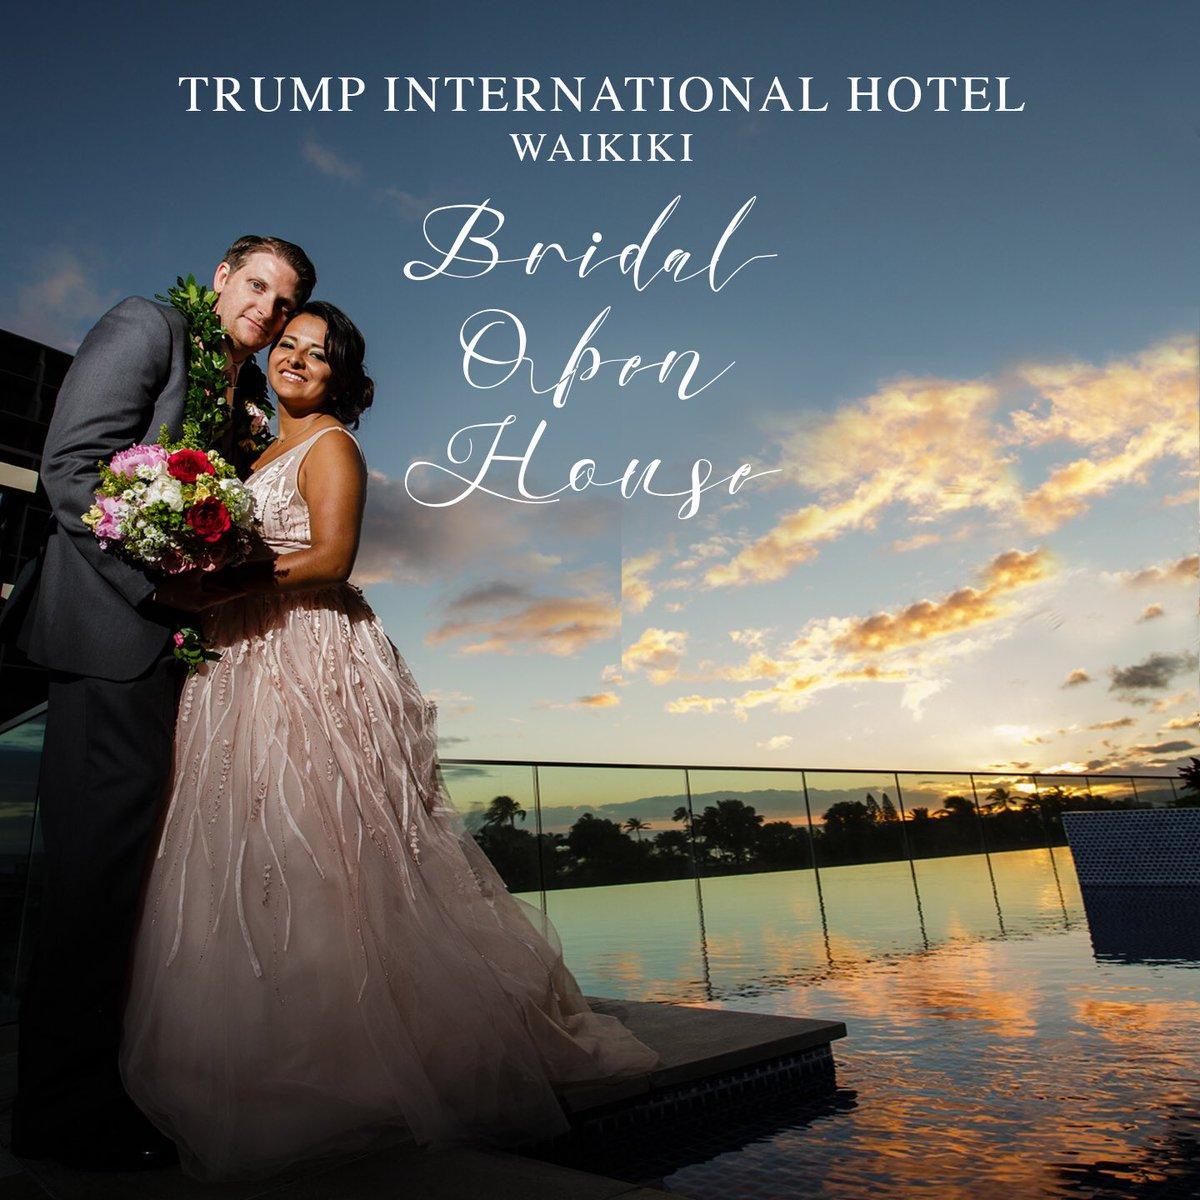 join me @ @TrumpWaikiki 2/25 6-8:30PM for the Bridal Open House rsvp: waikiki.events@trump.com #bridal #hawaii https://t.co/RvQ7ebxWnH